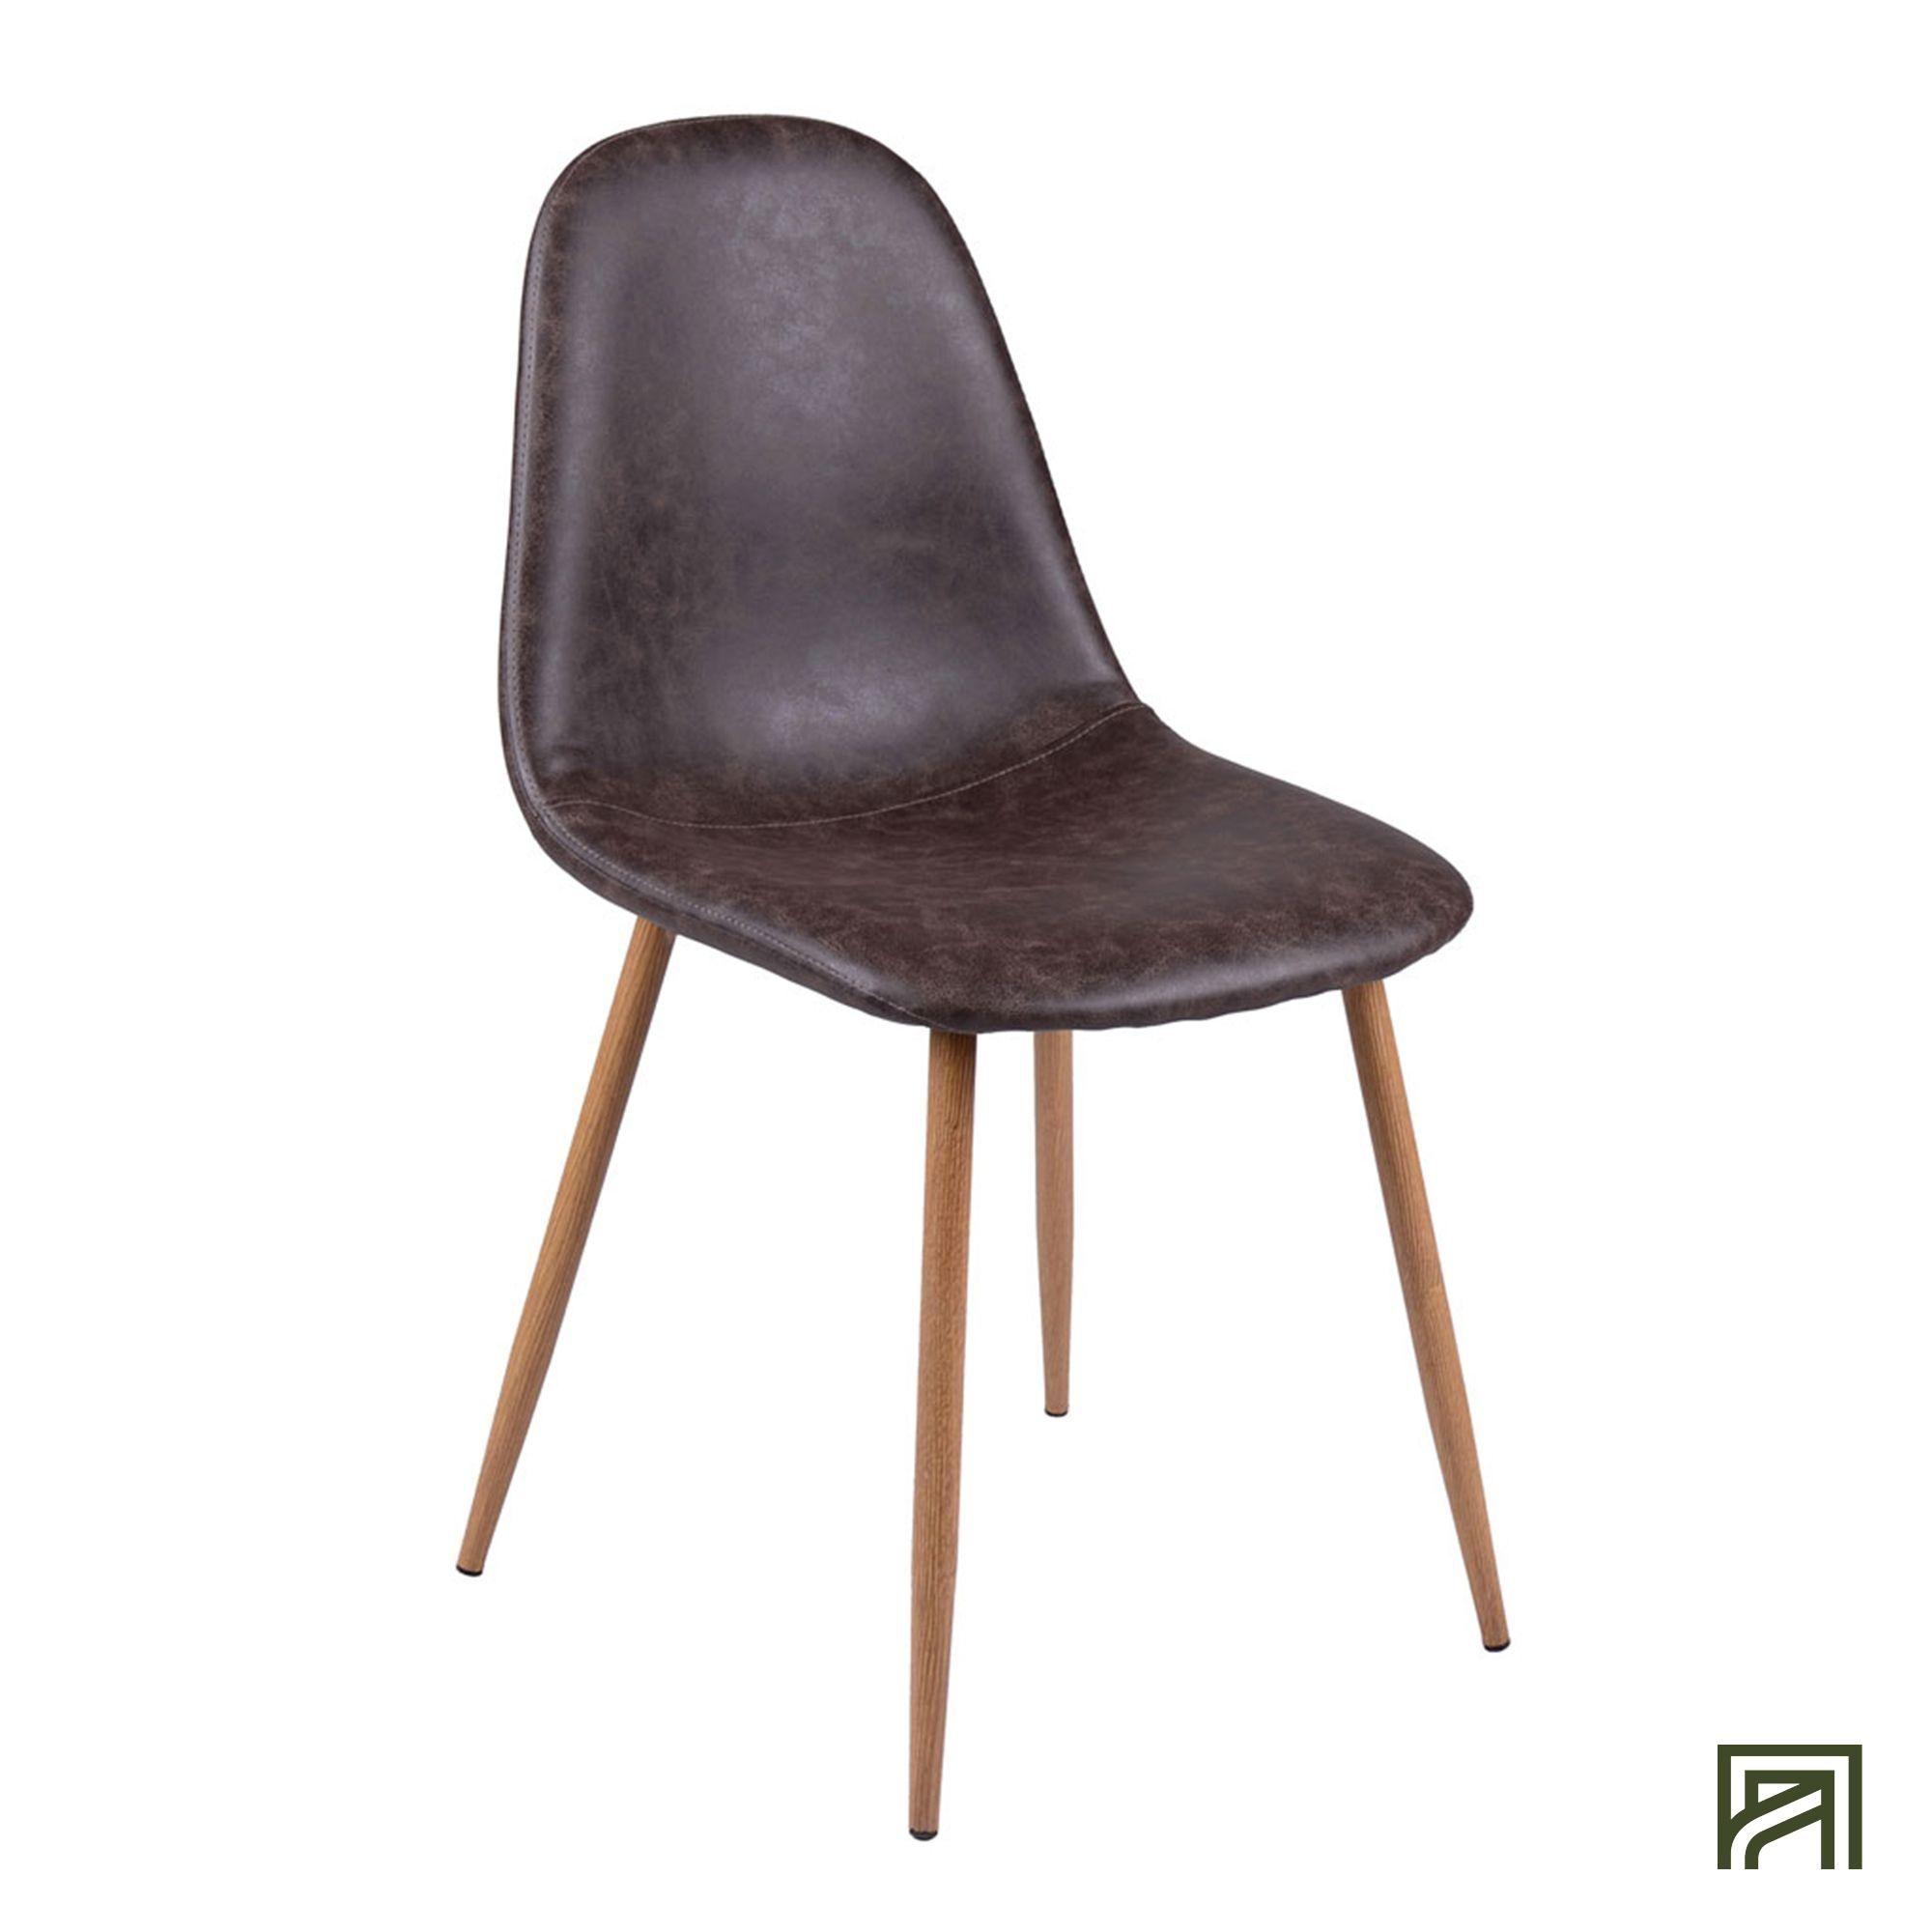 alinea : charlie chaise vintage - simili cuir marron - #Alinea